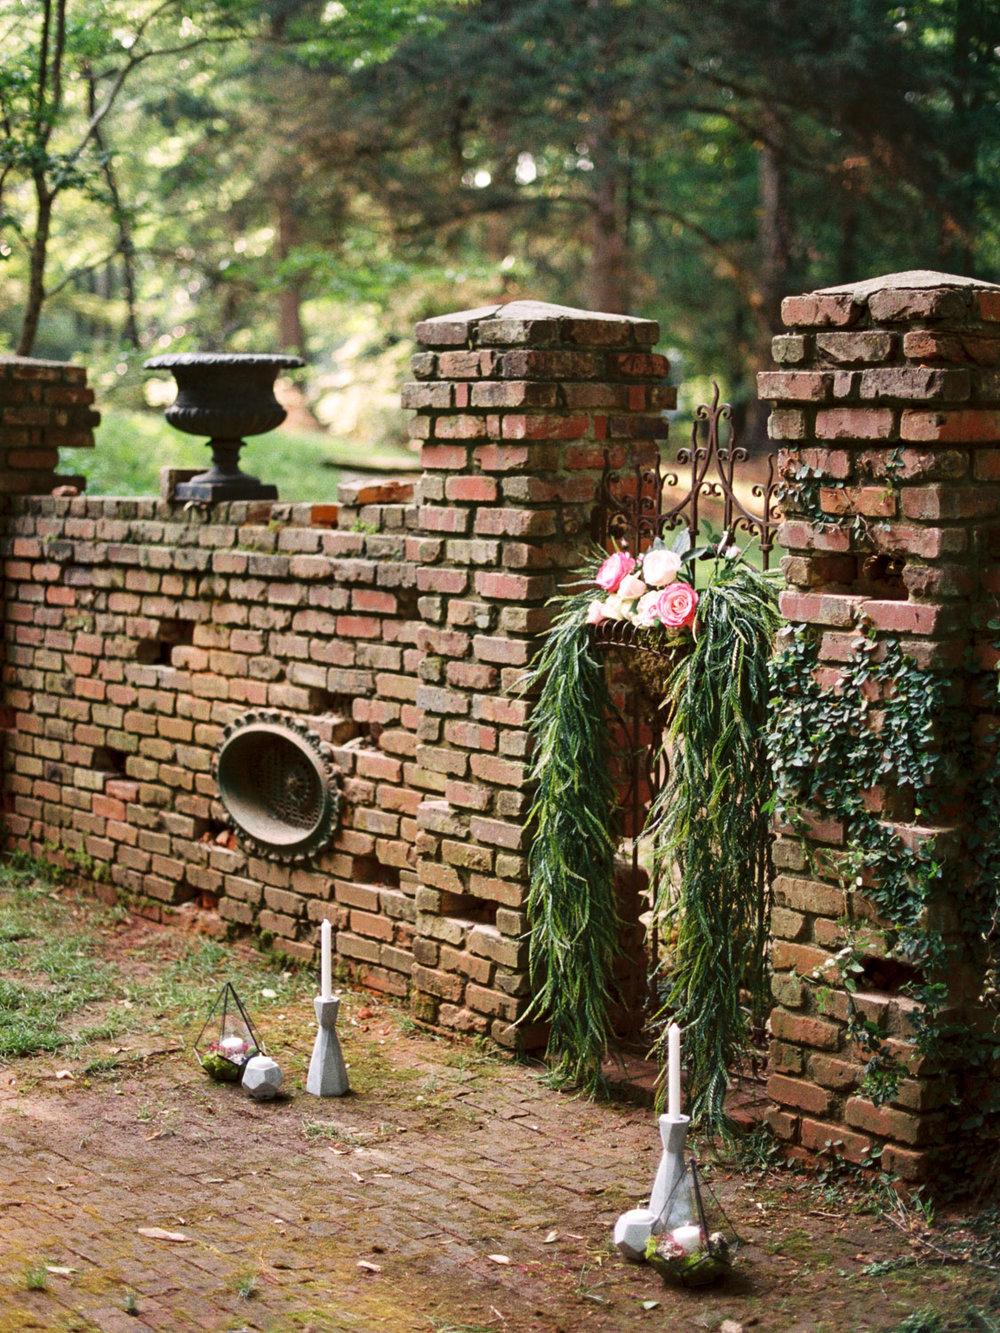 christinadavisphotography-romanticwedding-gardenweddinginspiration46.jpg